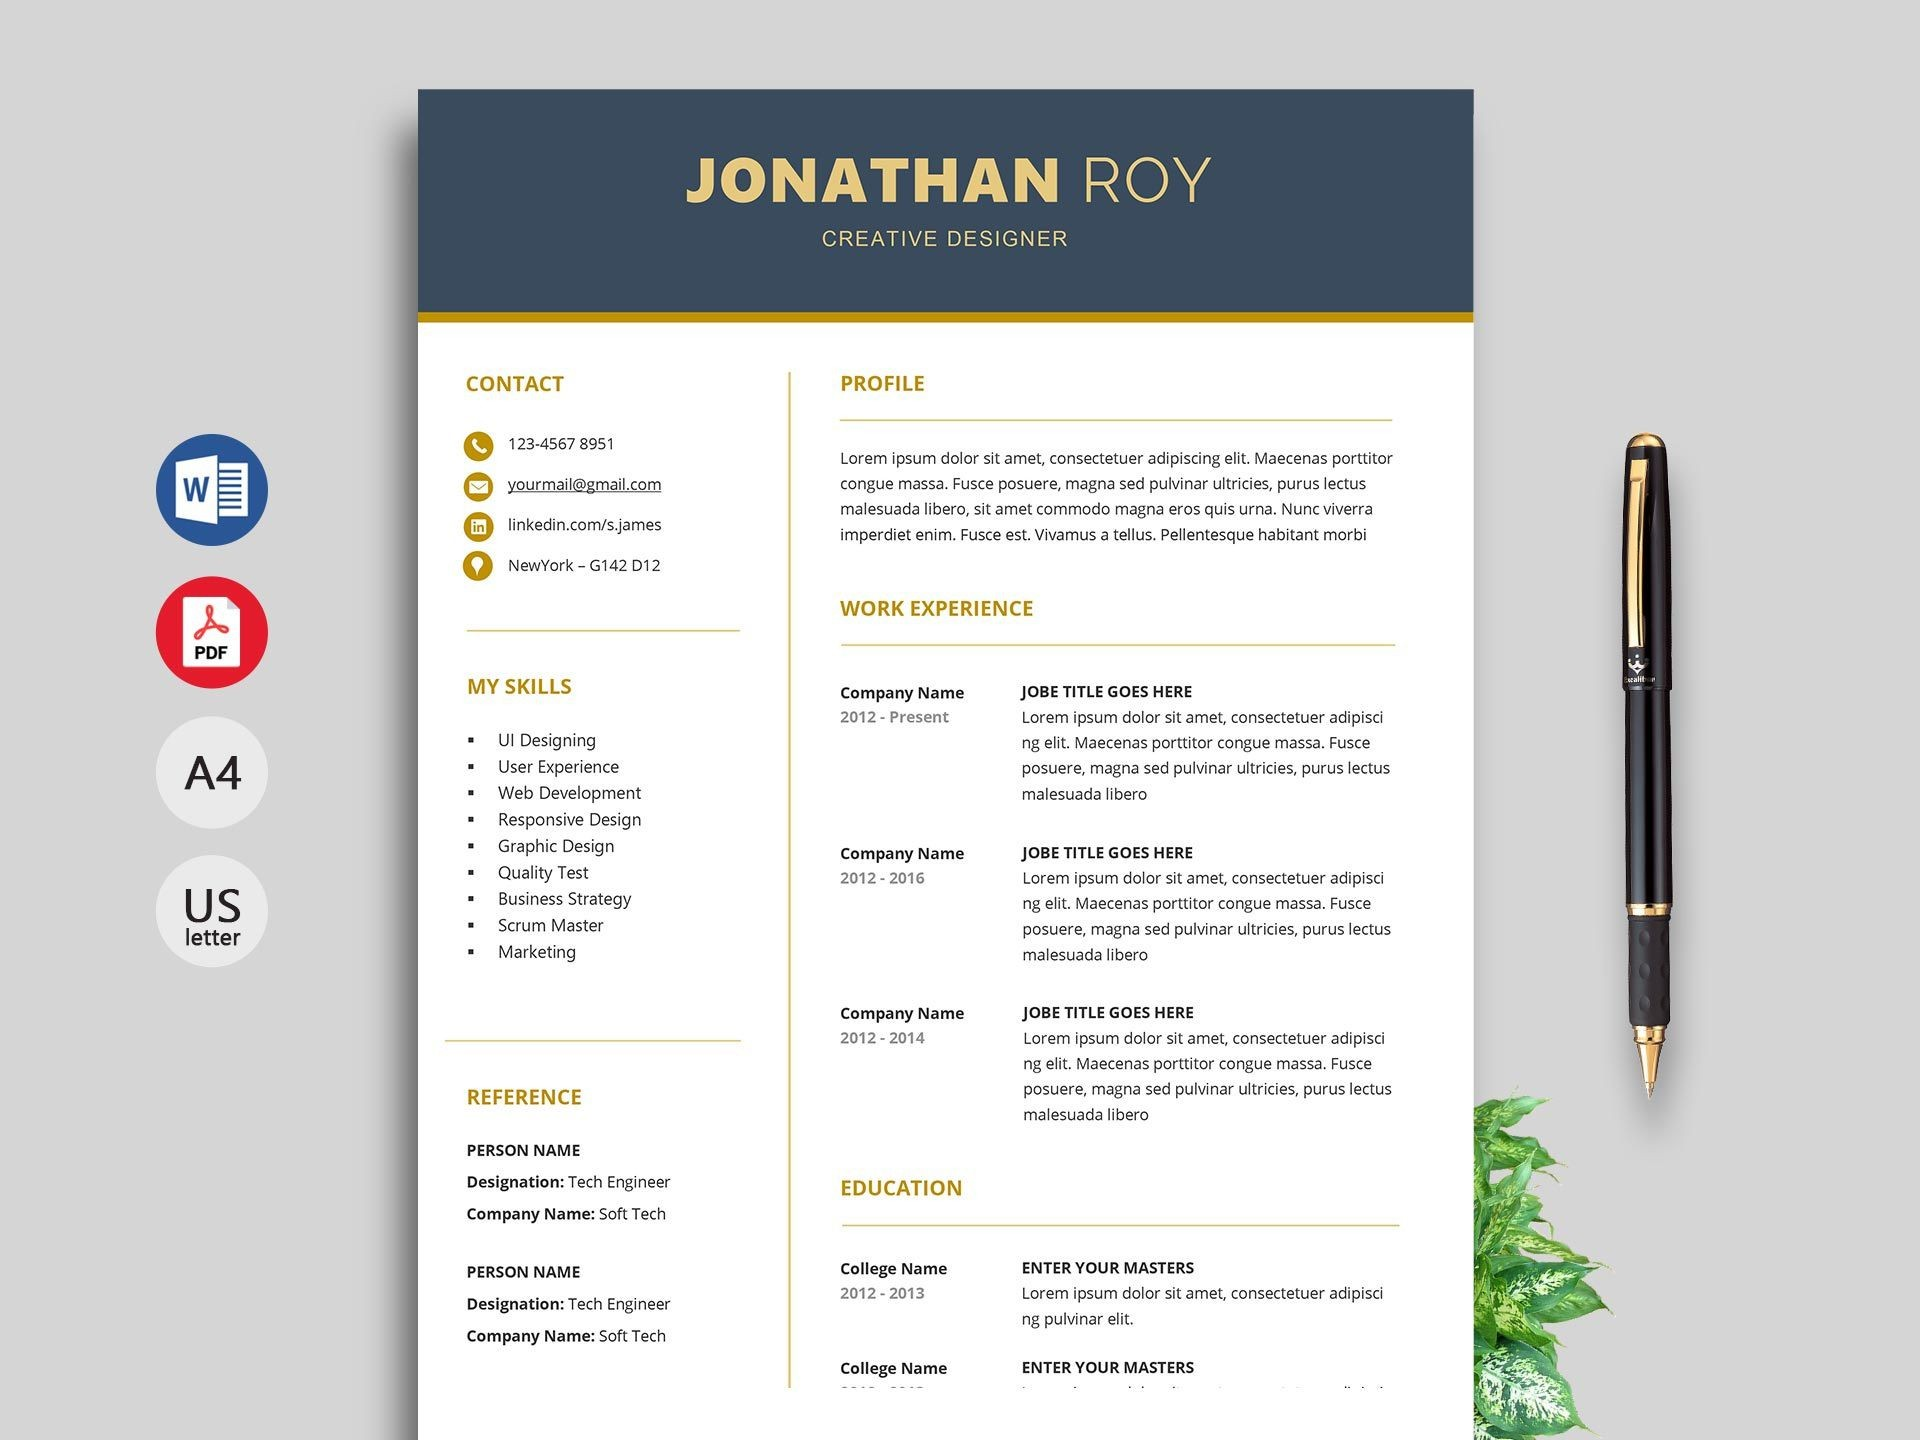 003 Marvelou Microsoft Word Resume Template Image  Reddit 2019 2010 Free Download1920